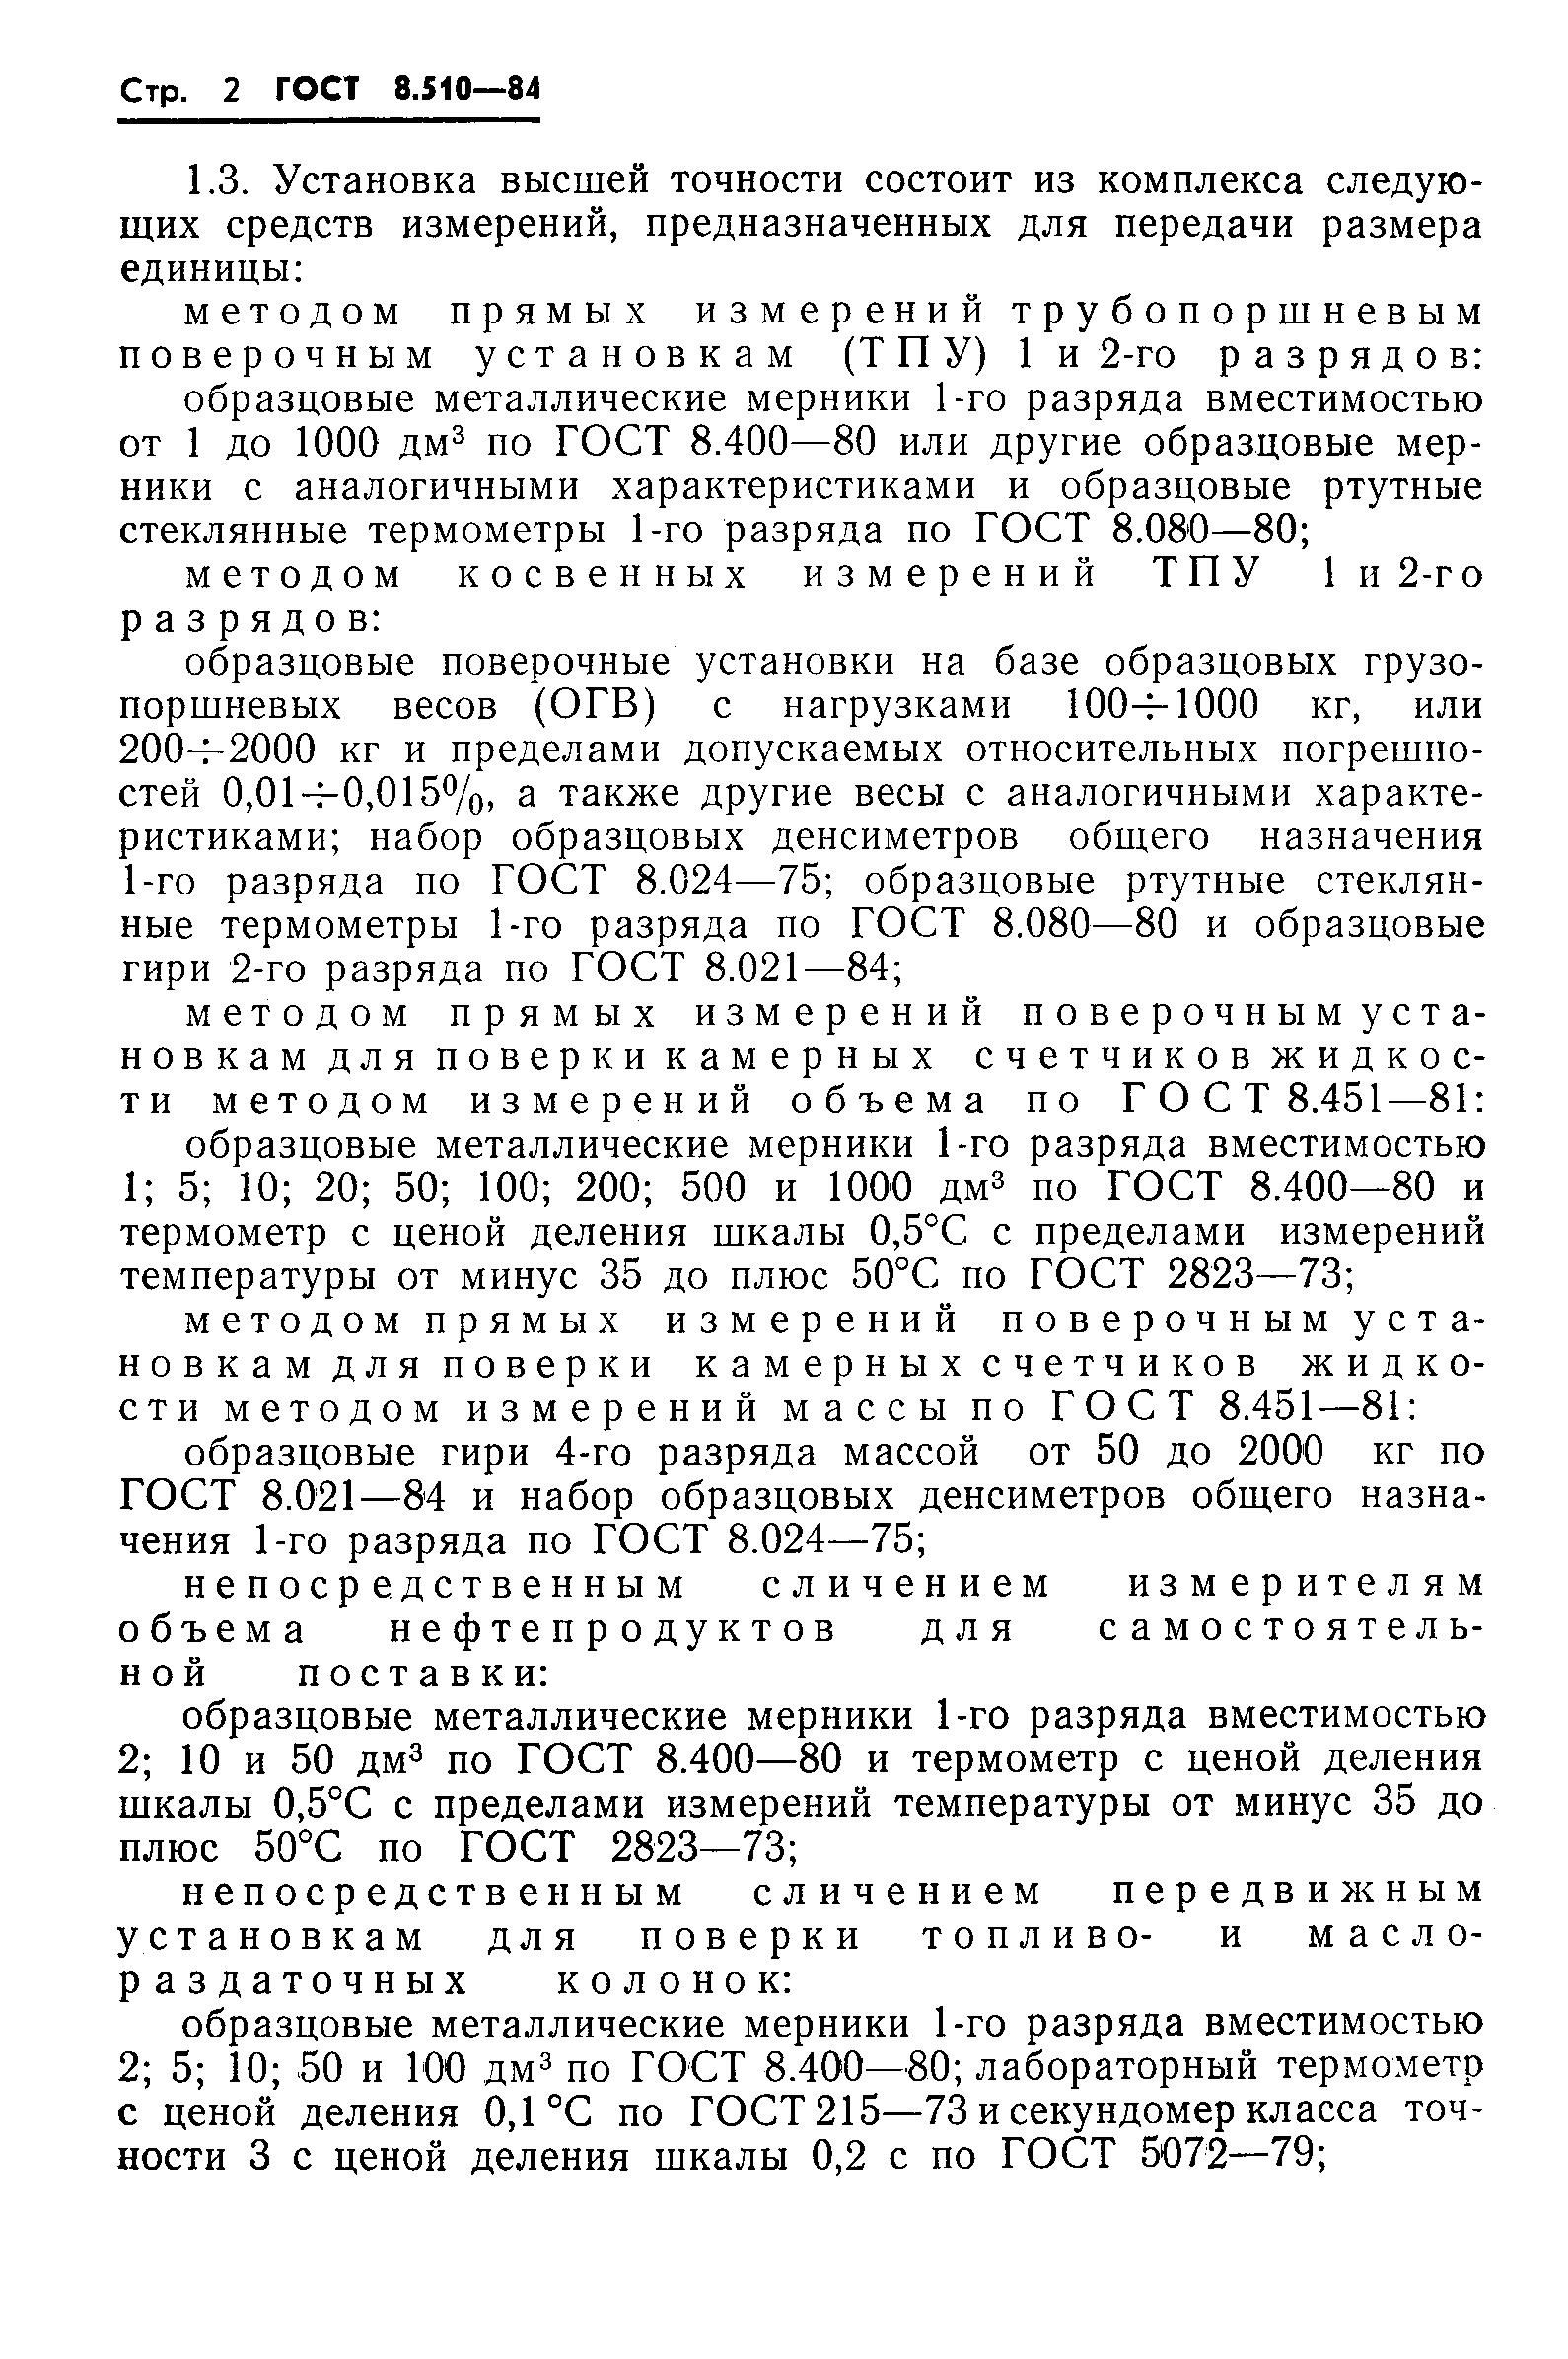 Поверочная схема 8.510